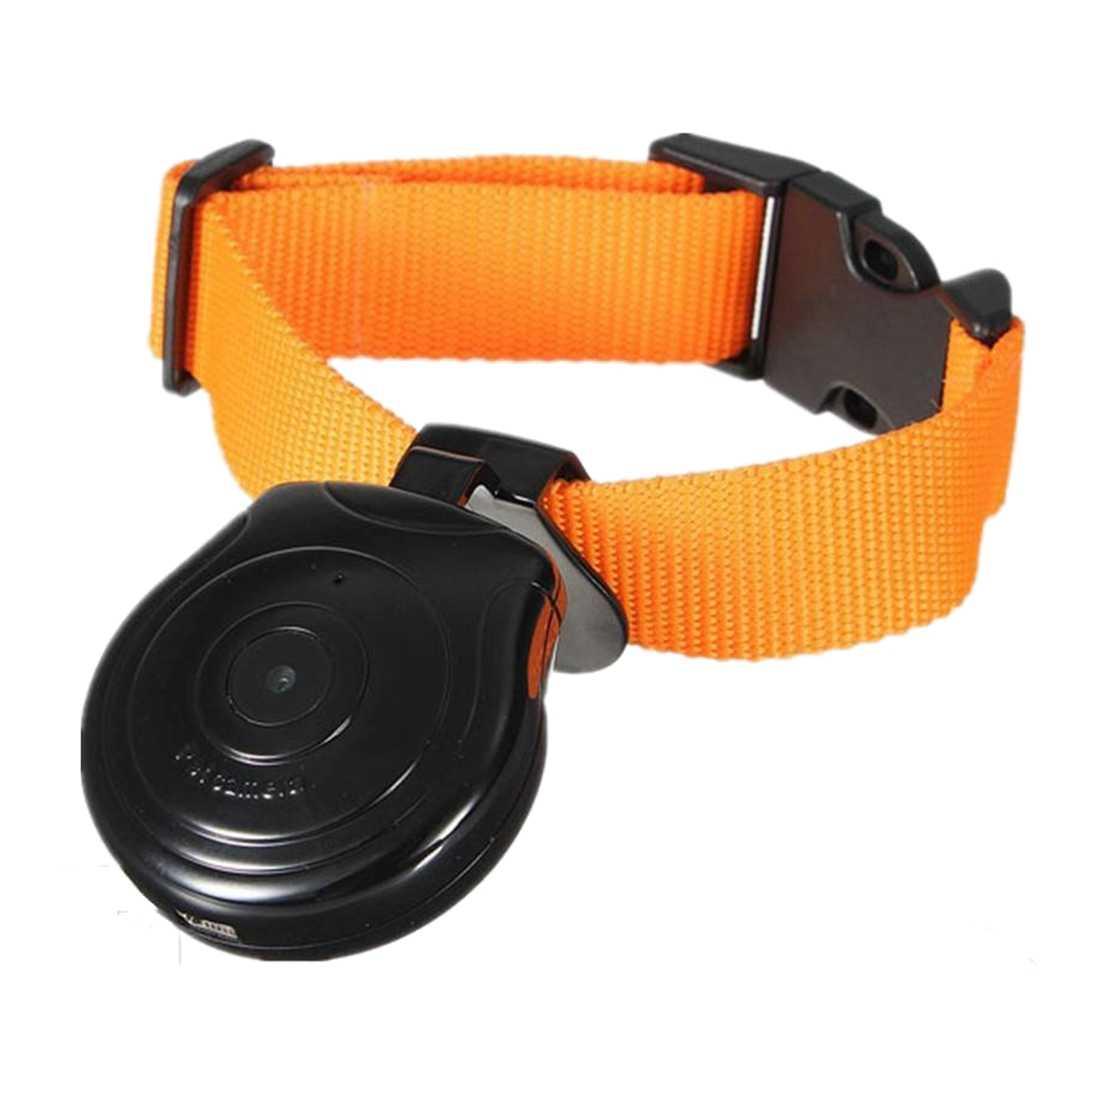 IALJ Топ Мини Цифровая камера видео запись камера видеорегистратор видео рекордер ошейник для собаки кошки